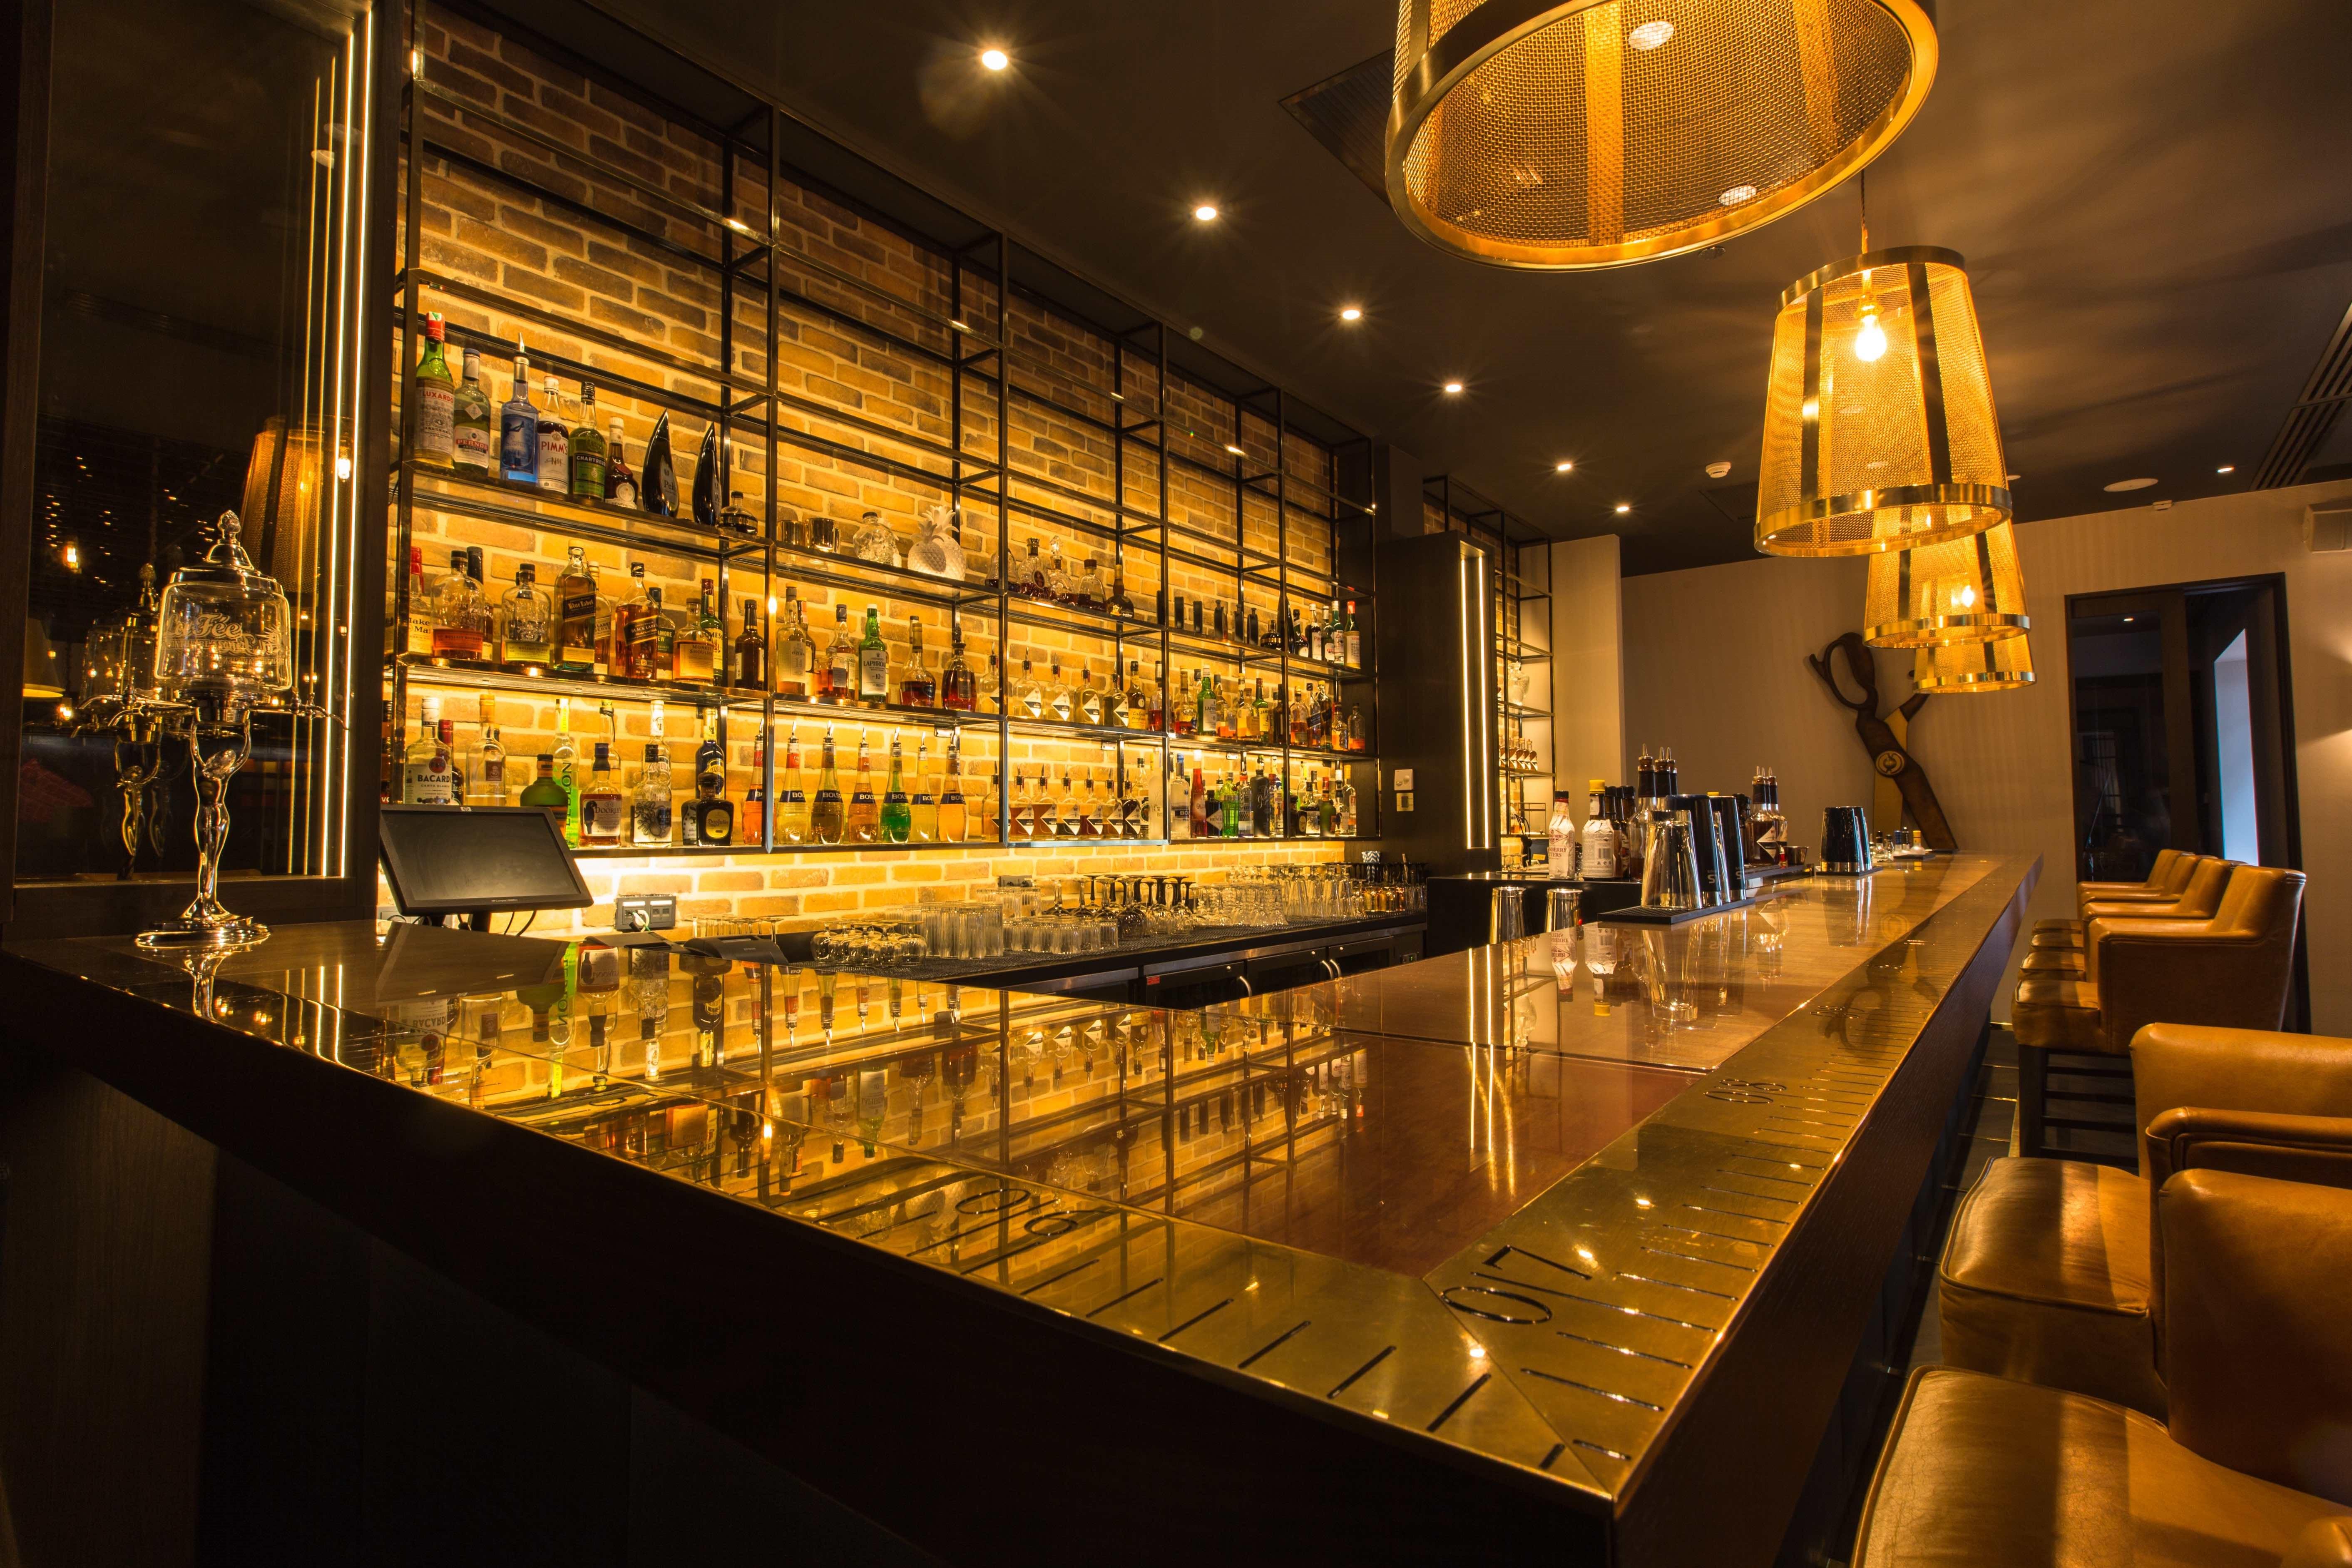 best hotel bar award the tailor beste hotelbar van amsterdam. Black Bedroom Furniture Sets. Home Design Ideas